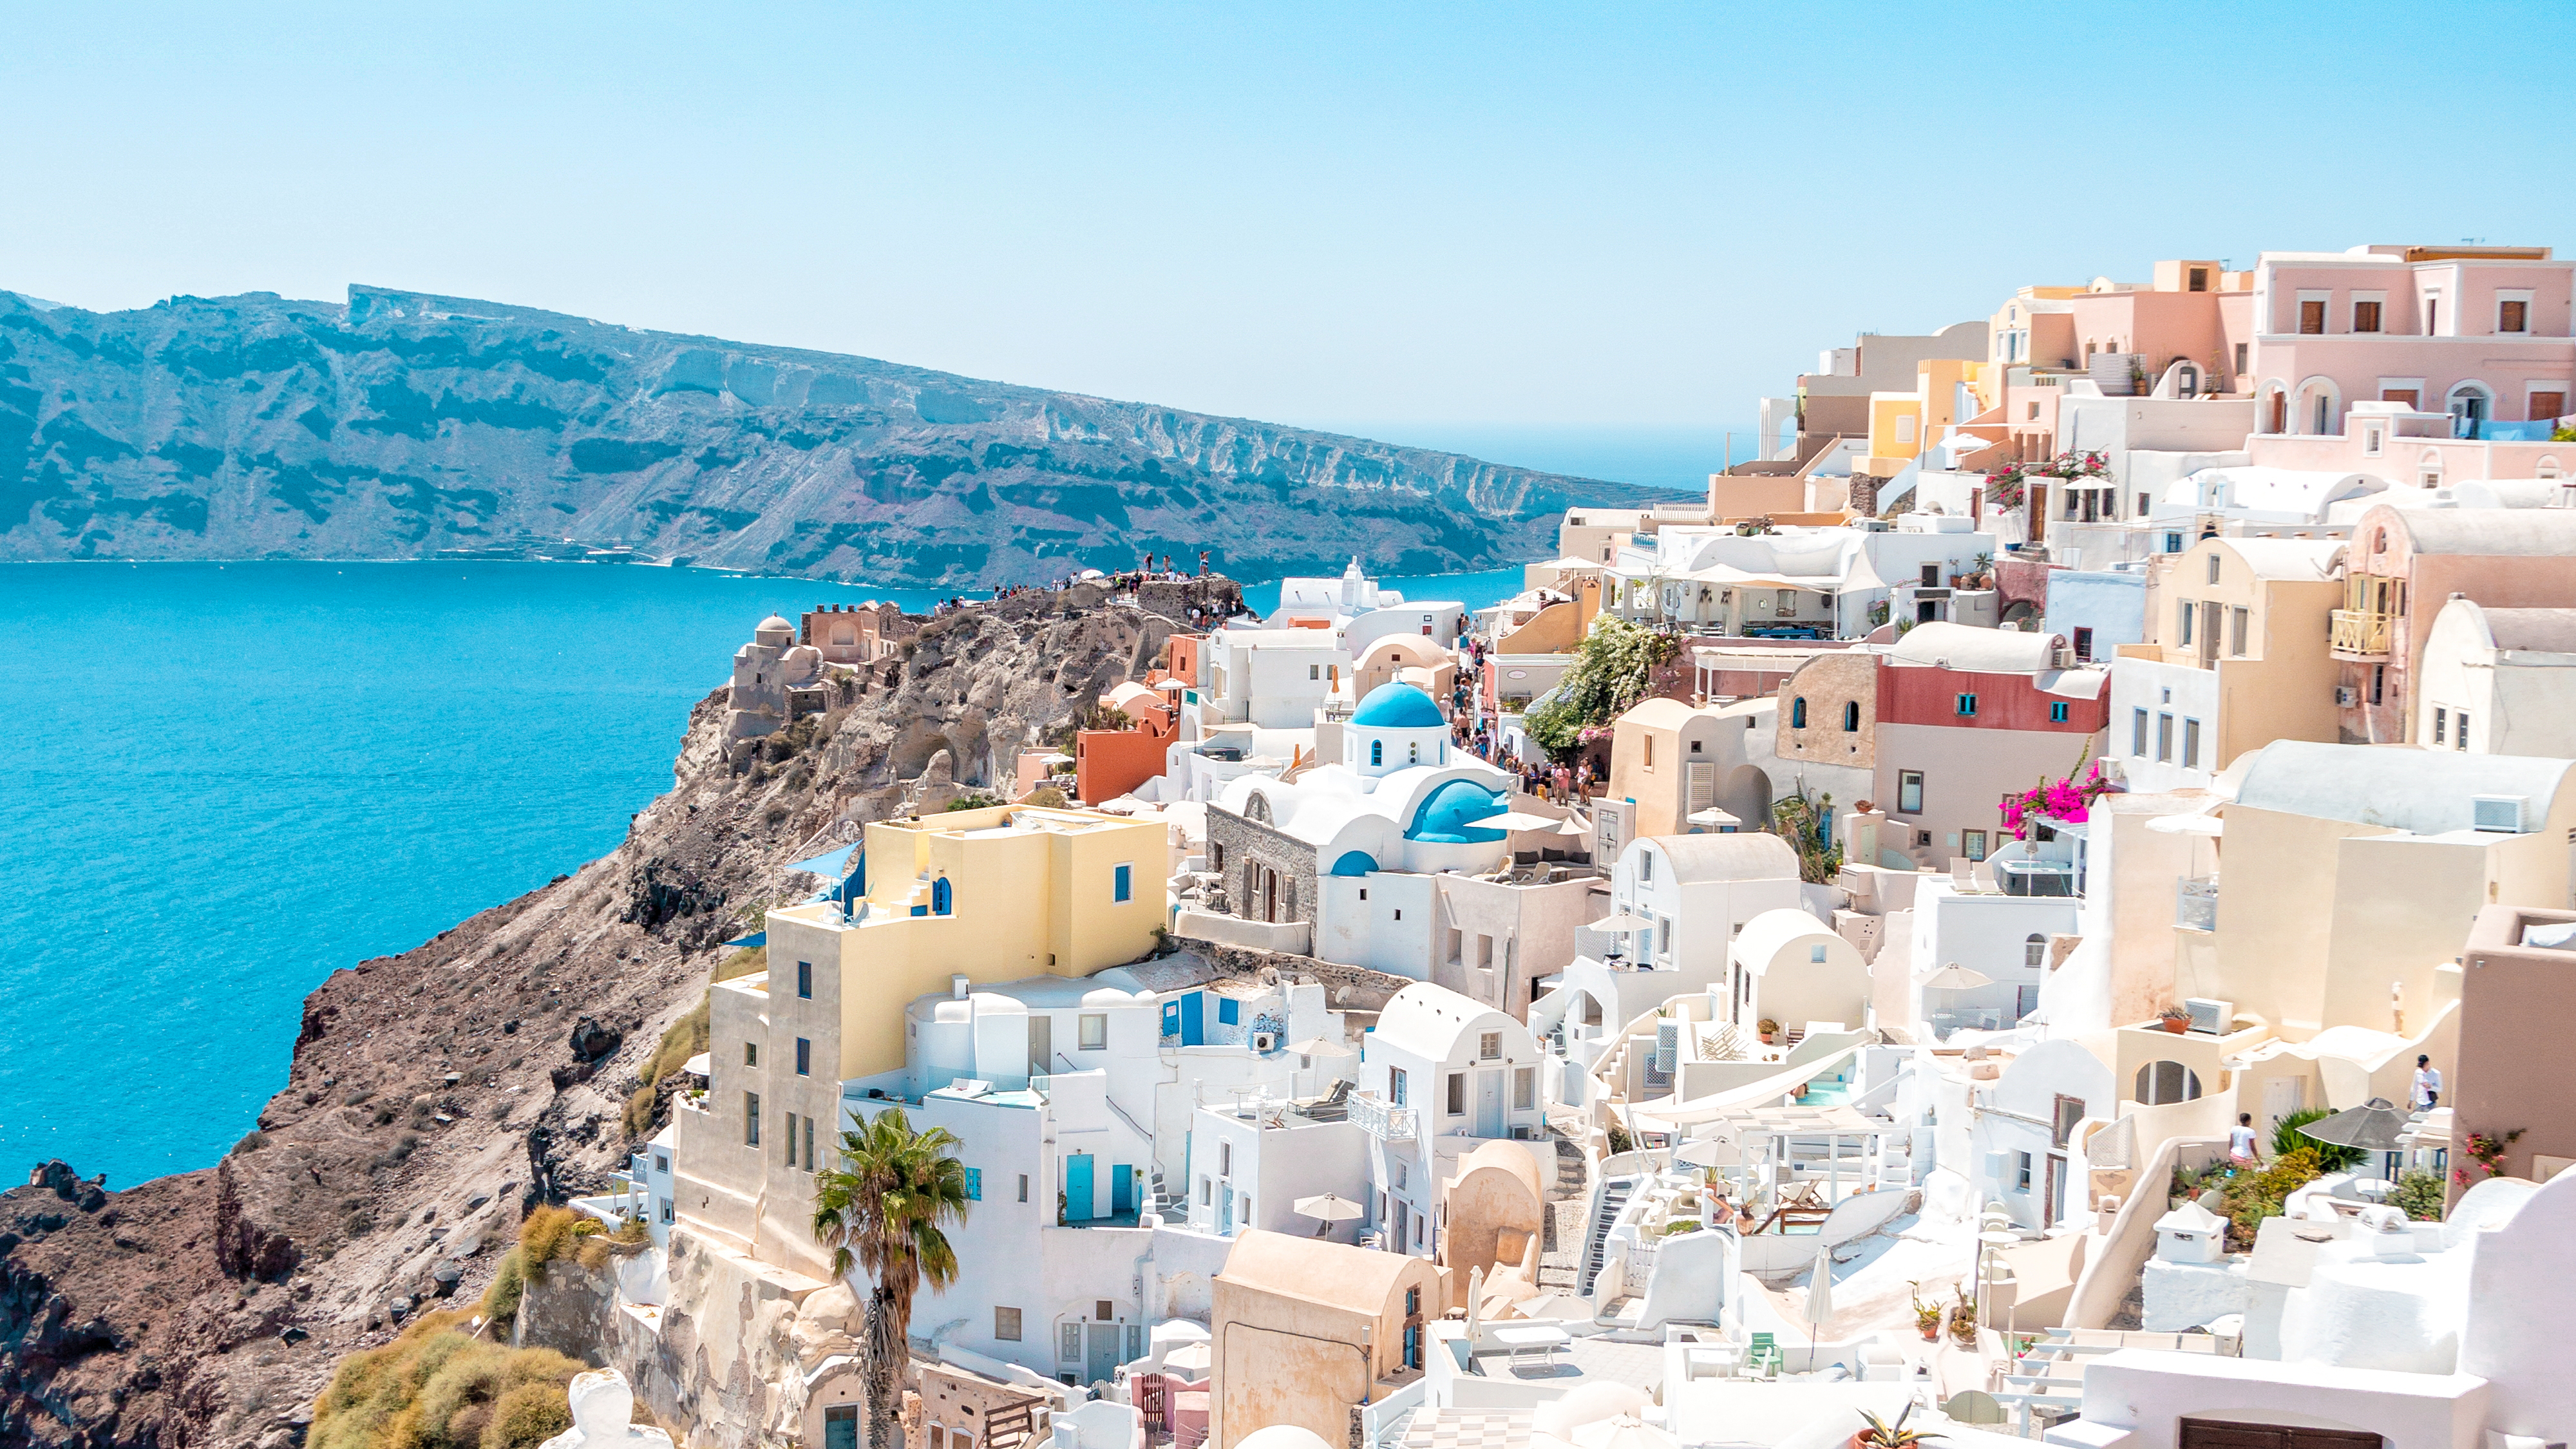 Oia, Santorini ©️ Daniel Caspi